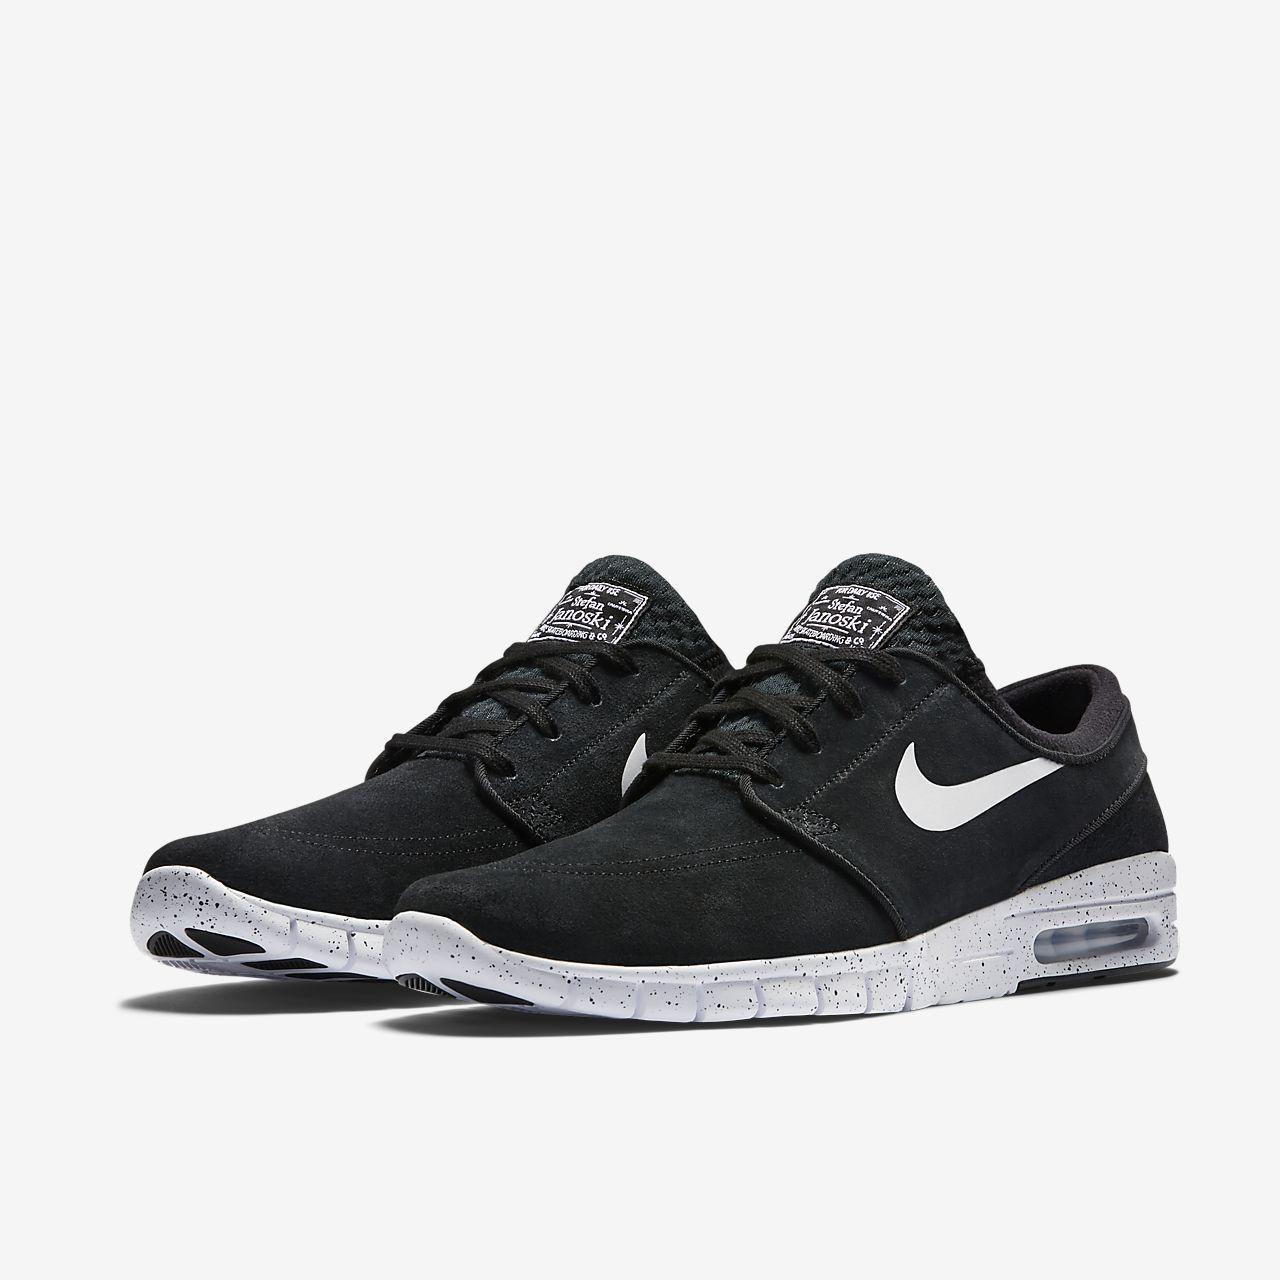 Nike Hommes Stefan Janoski Chaussure Max L Footlocker réduction Finishline xmRvE1t